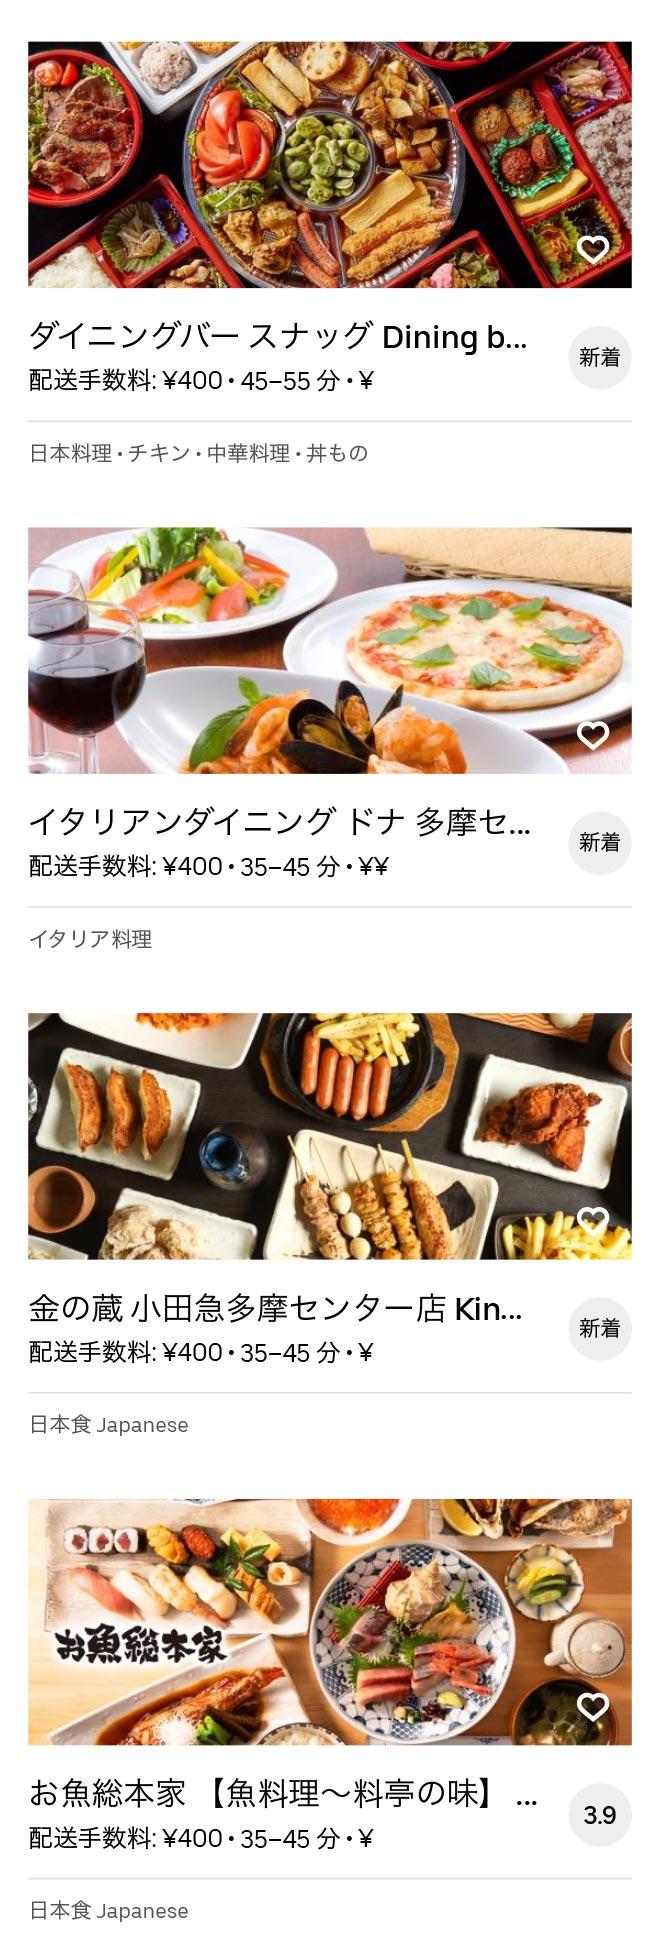 Seiseki menu 2007 10